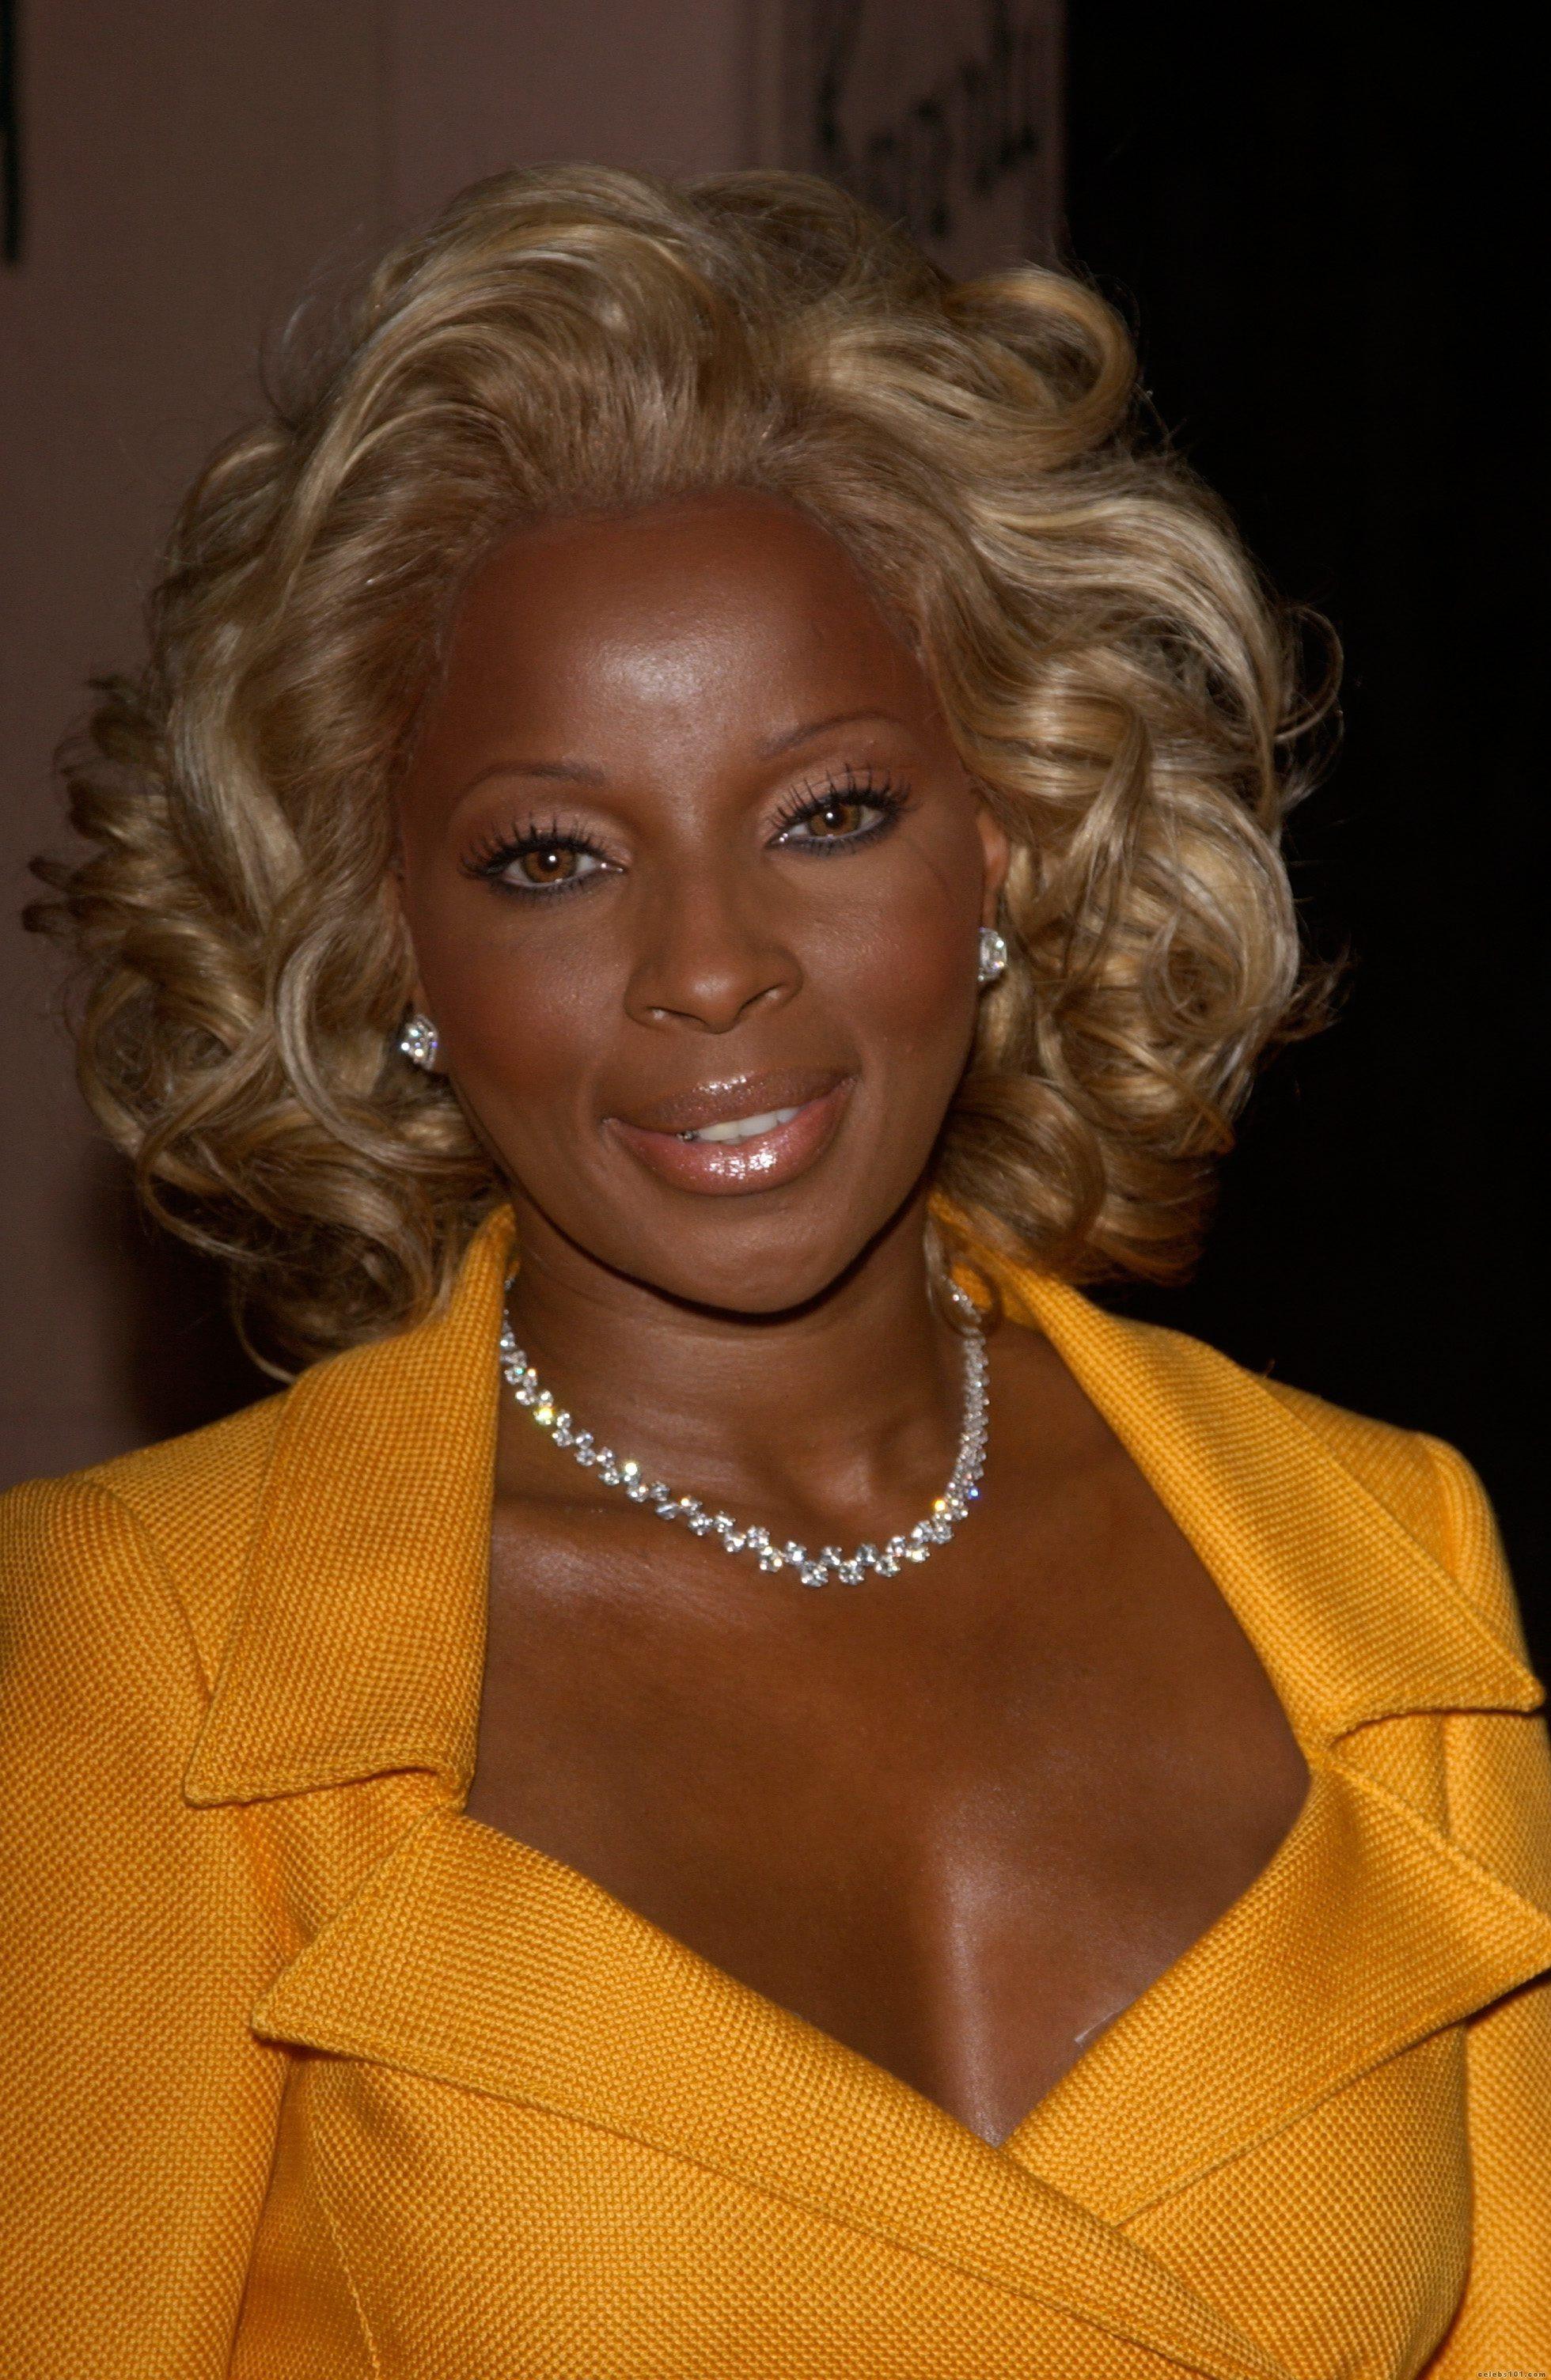 Kandi Burruss Bob Hairstyles Mary J Blige Hairstyles Easy Hairstylescom Mjb Fan